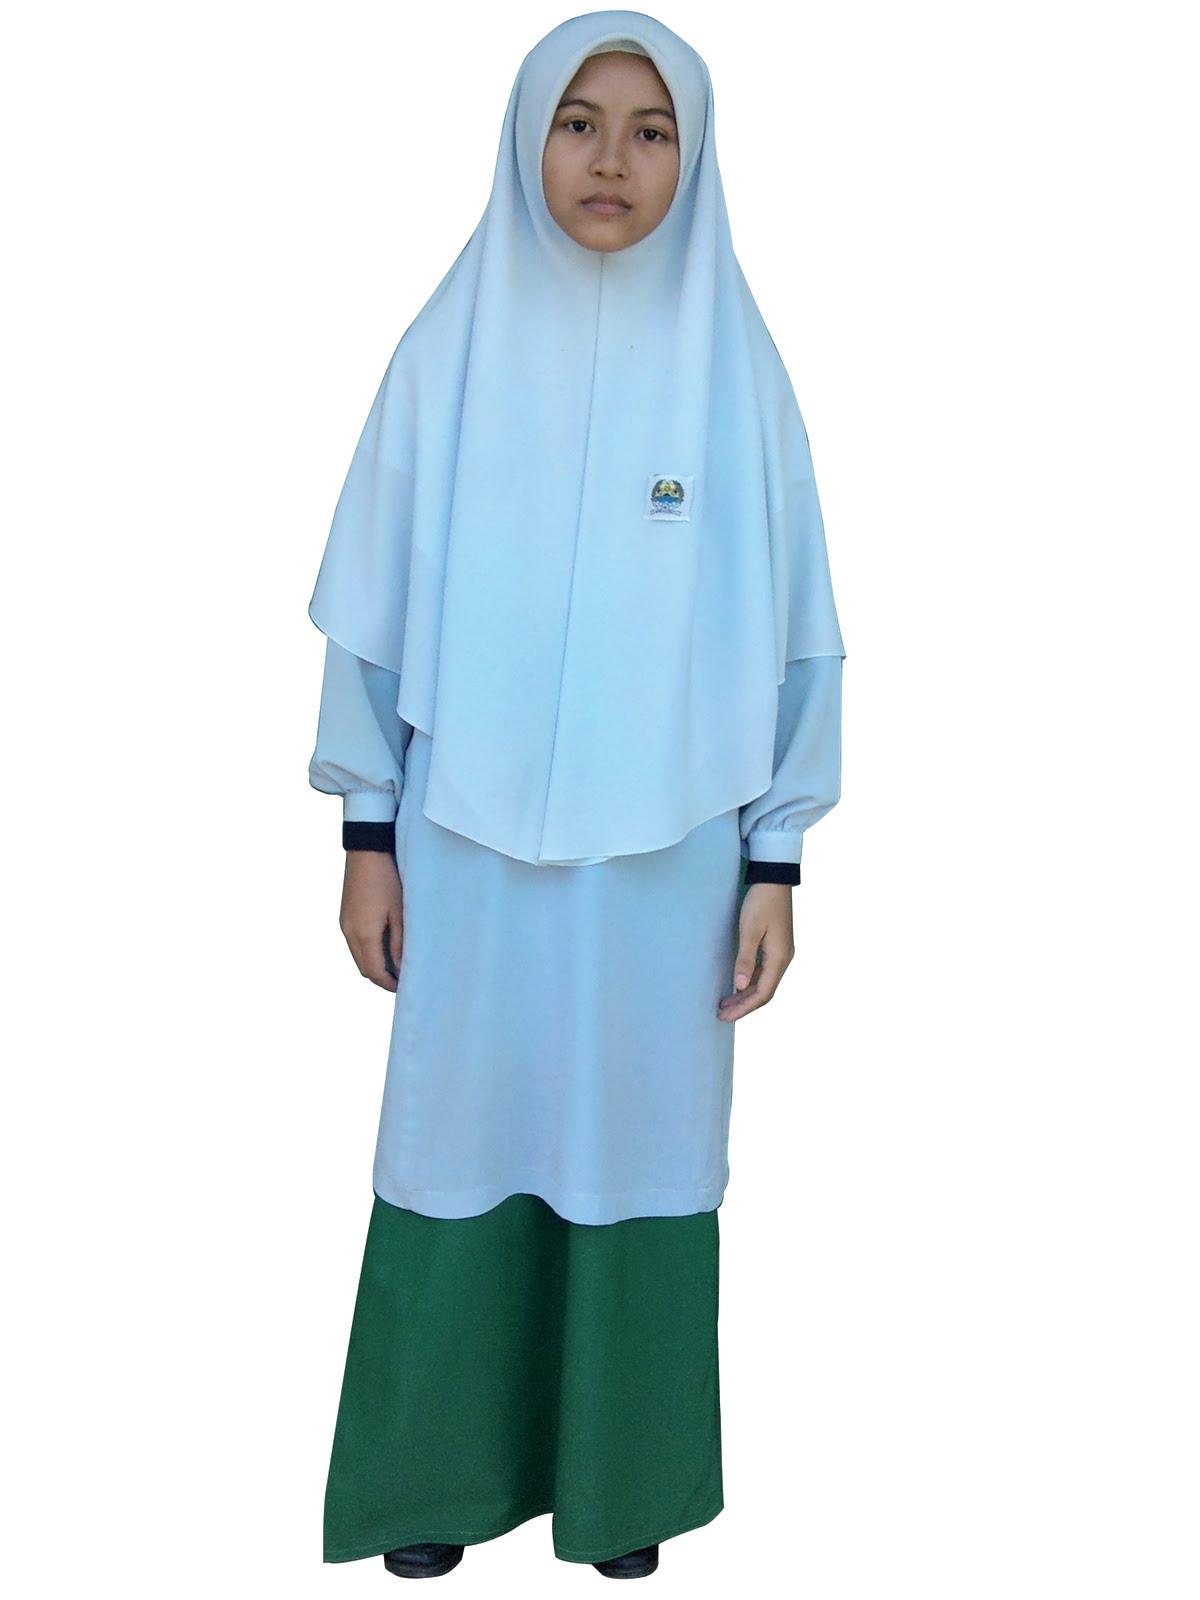 Pepek Perempuan Melayu http://ercolcollectors.co.uk/help/gambar-murid